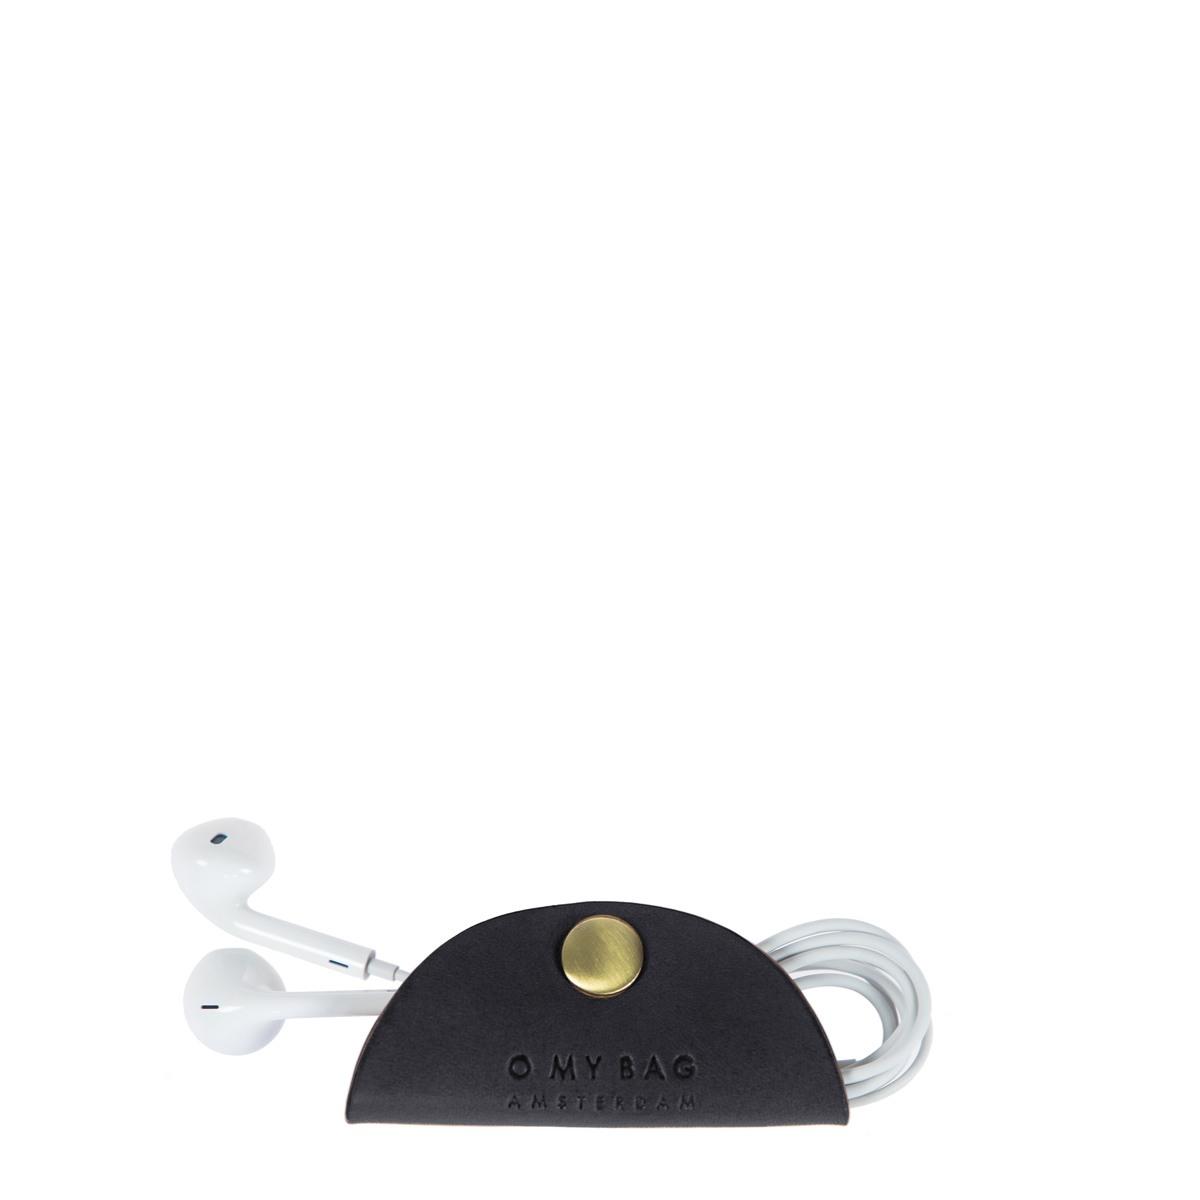 Cord Taco Headphone case Black o my bag